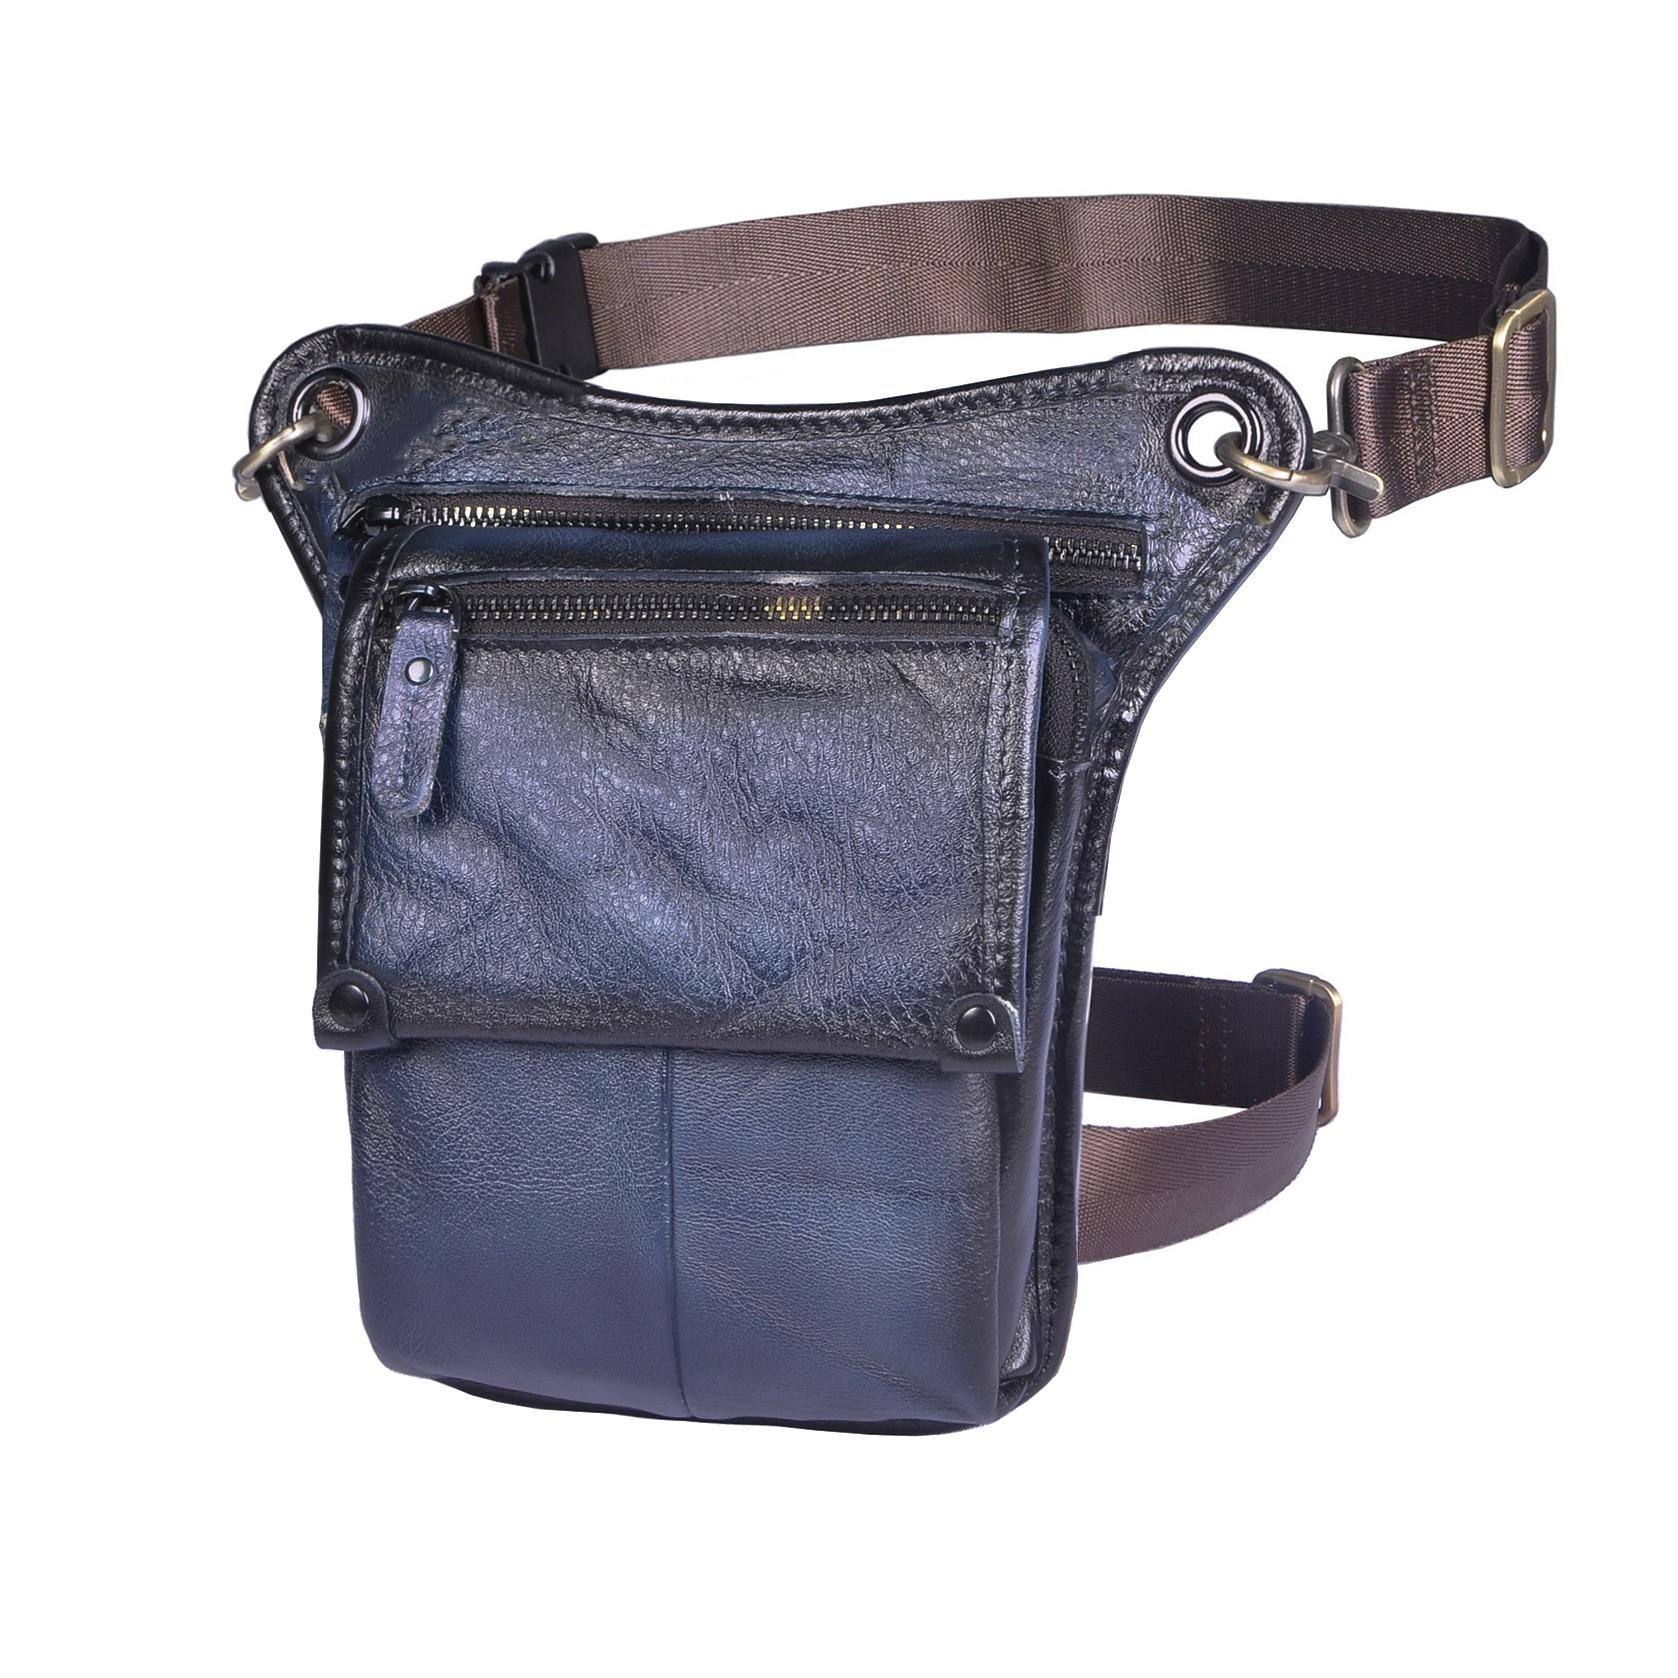 Quality Real Leather Men Multi-function Design Small Messenger Bag Fashion Travel Fanny Belt Waist Pack Drop Leg Bag Male 211-4